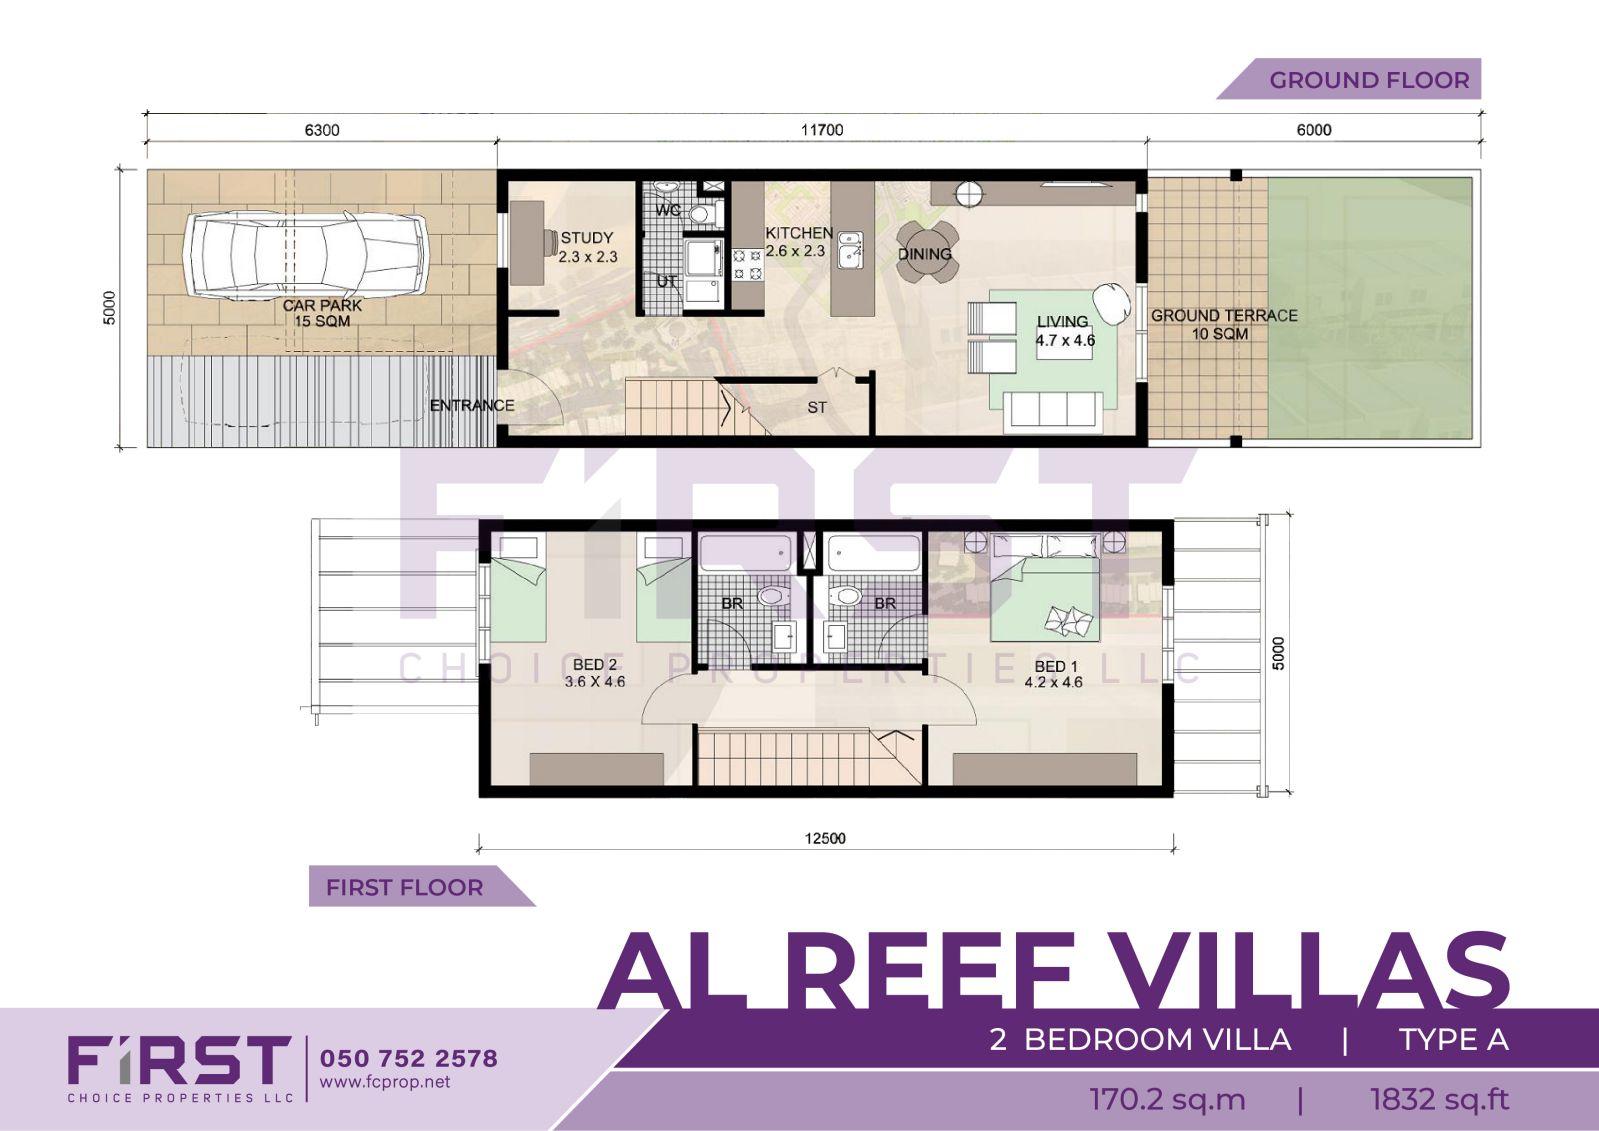 Al Reef Abu Dhabi Al Reef Villas 2 Bedroom Villa Type A 170.2 sq.m 1832 sq.ft.jpg